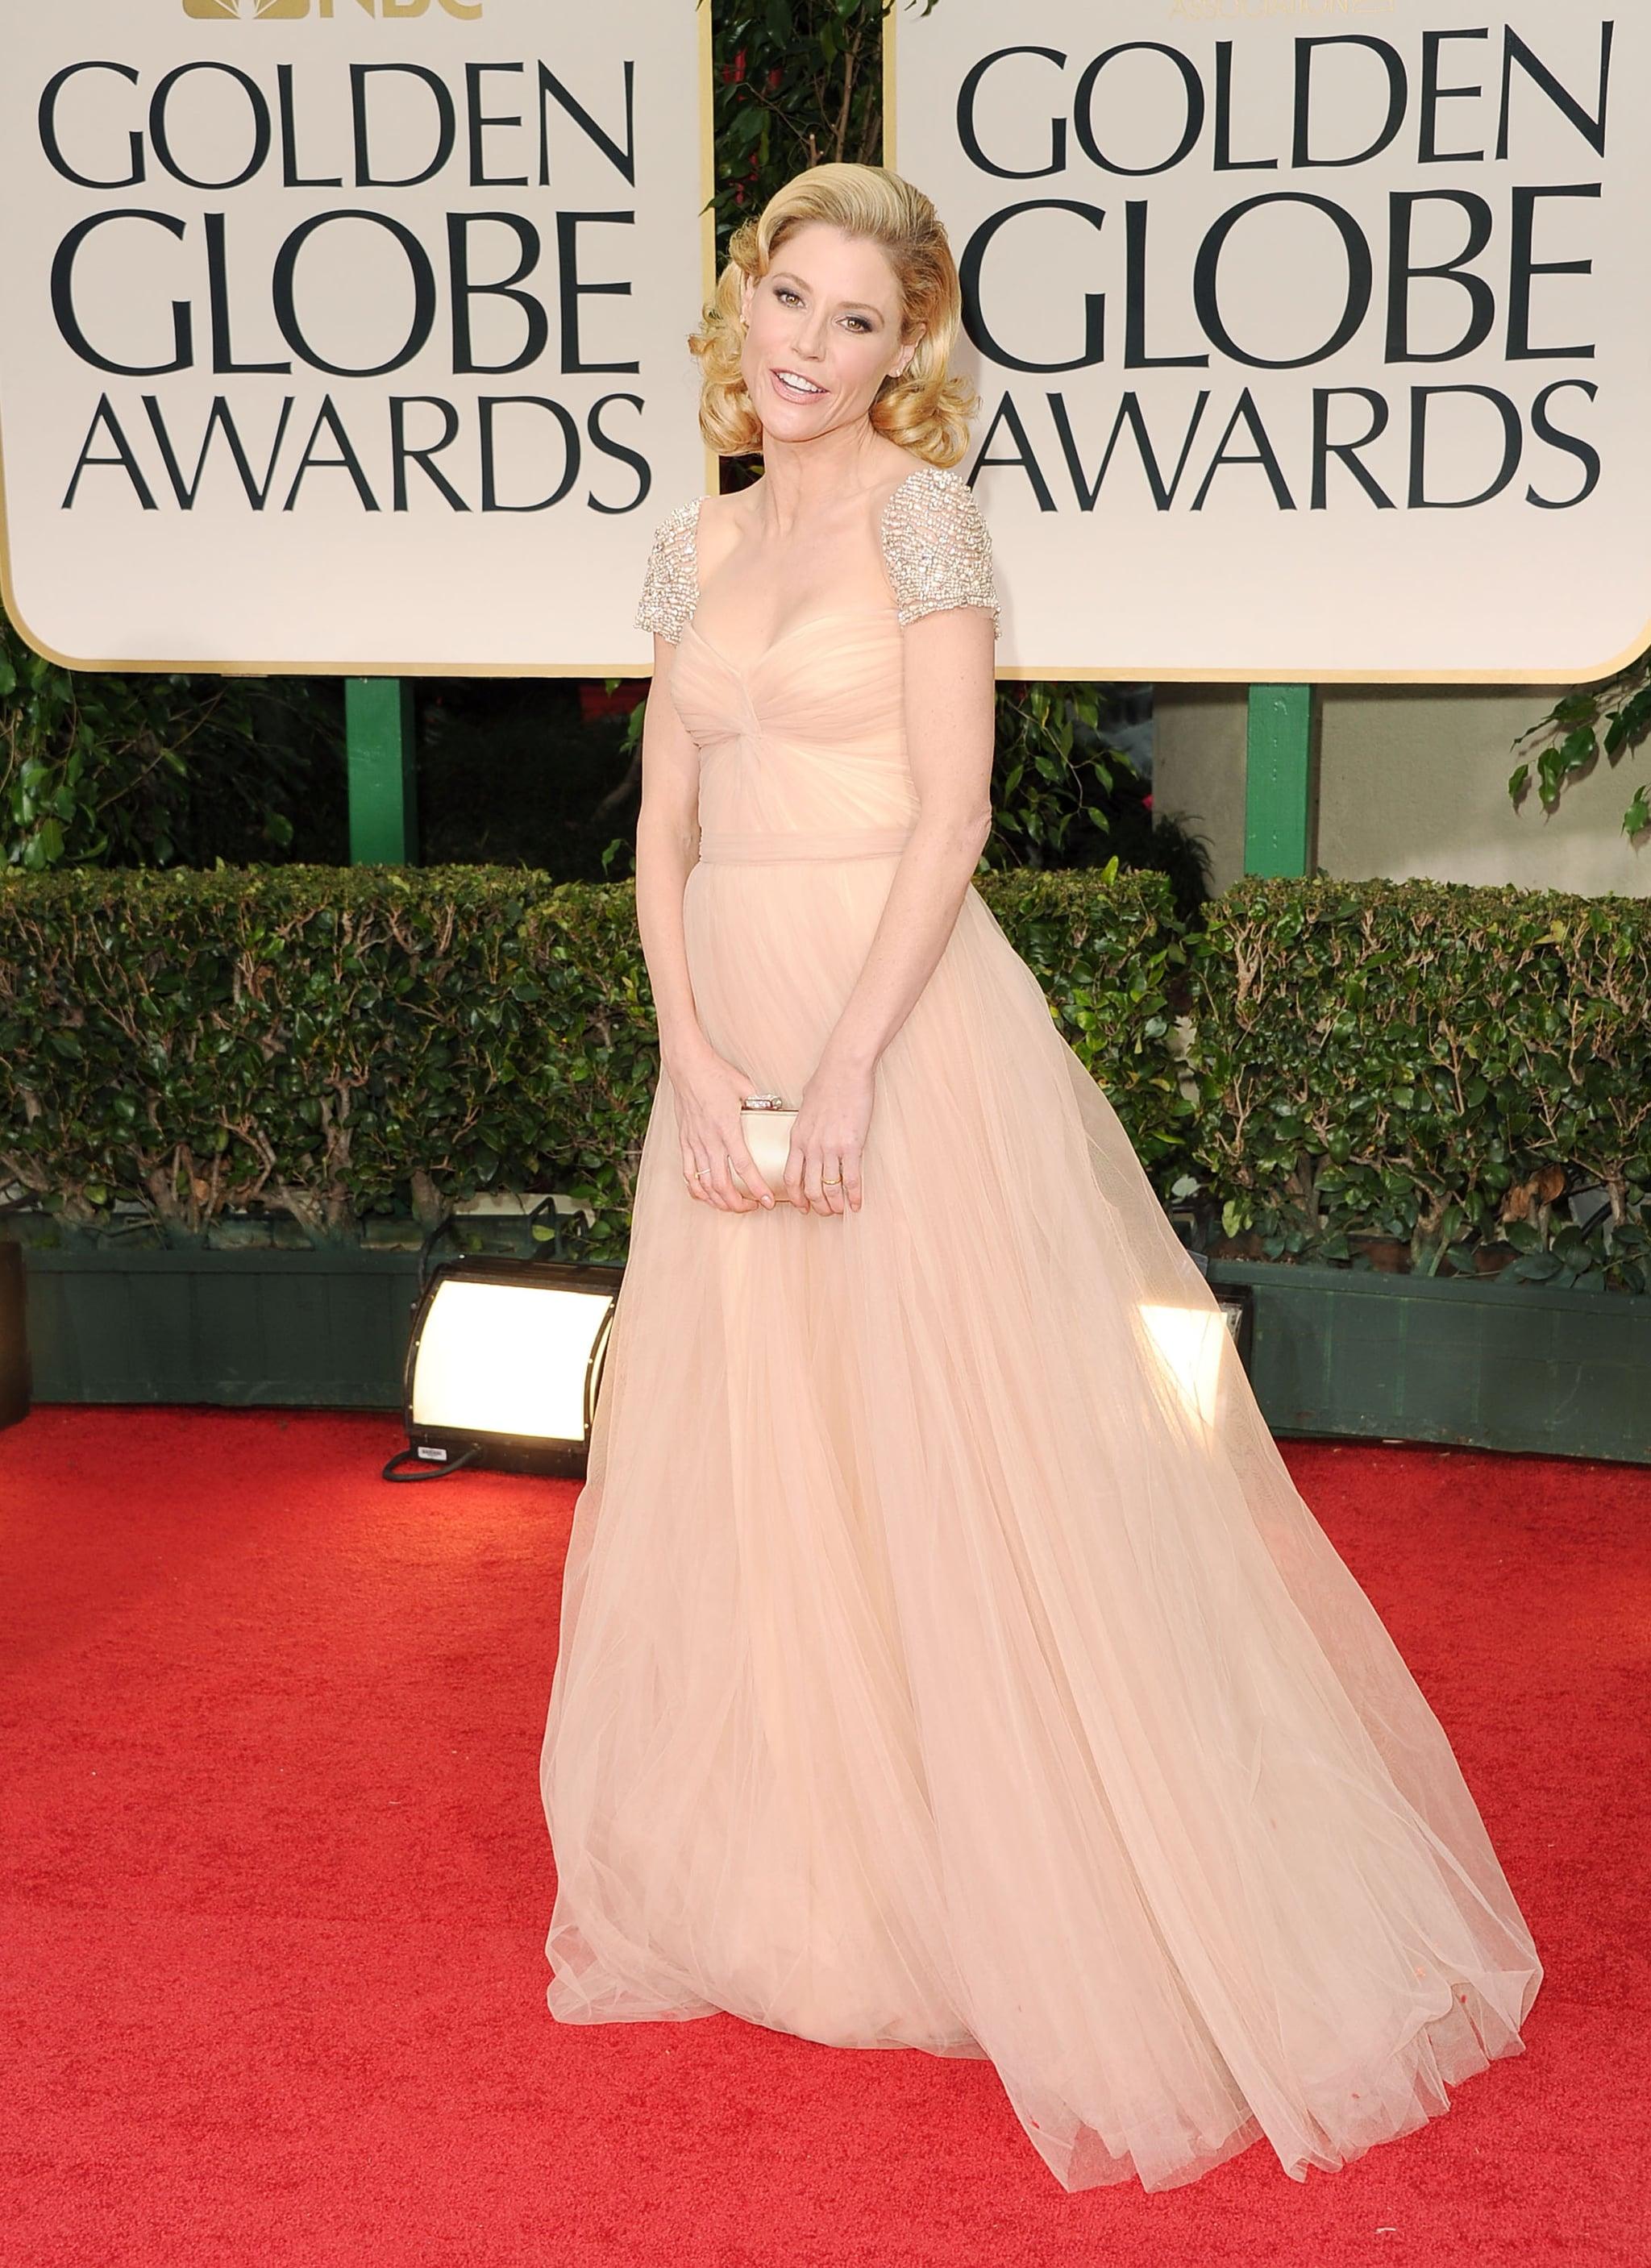 Julie Bowen on the red carpet at the Golden Globes.